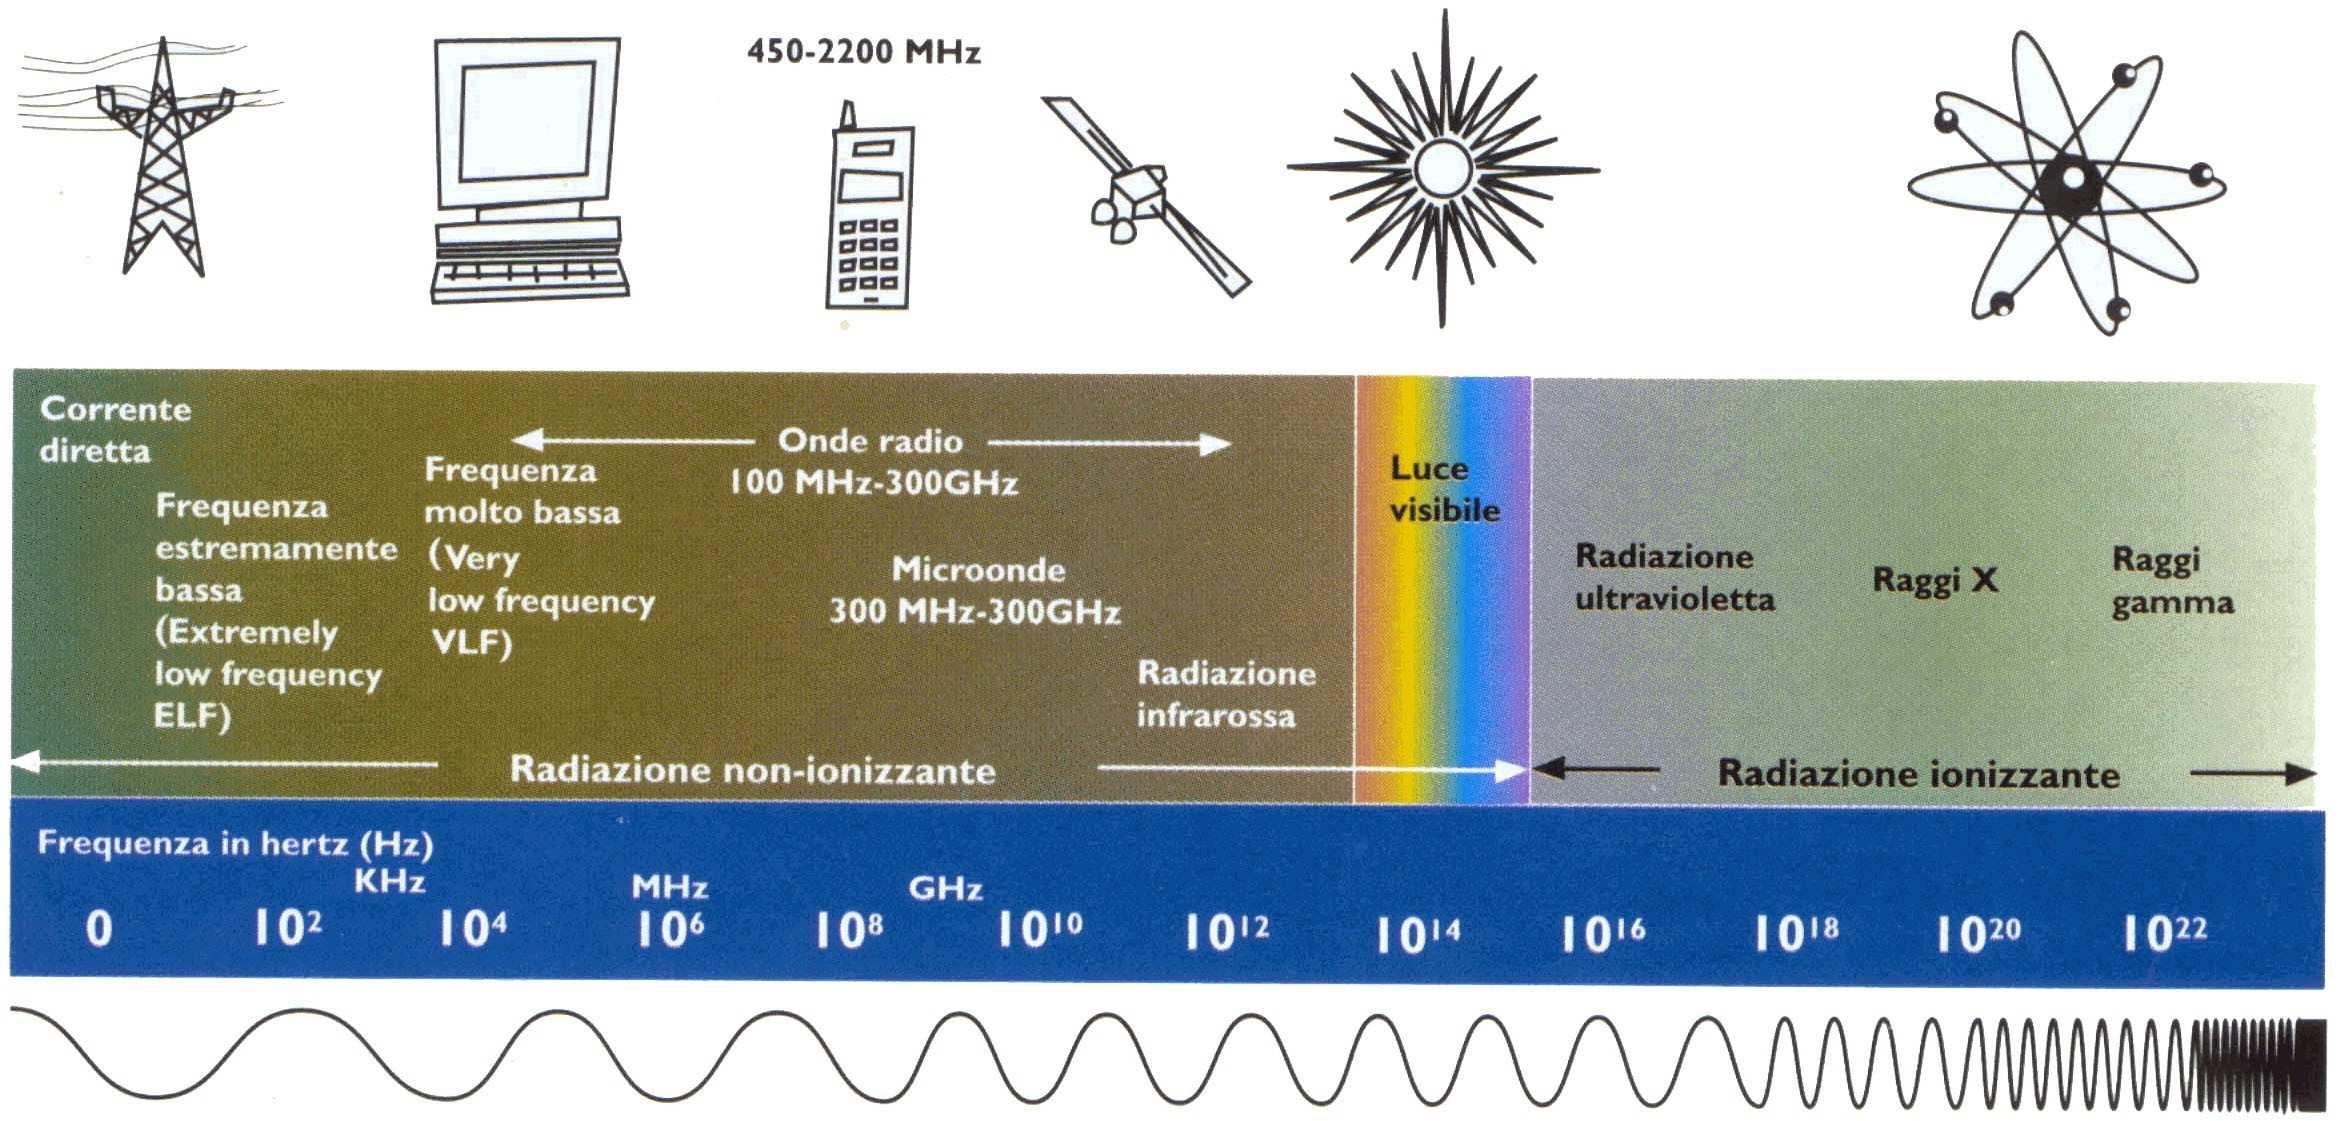 dimensioni radio freq